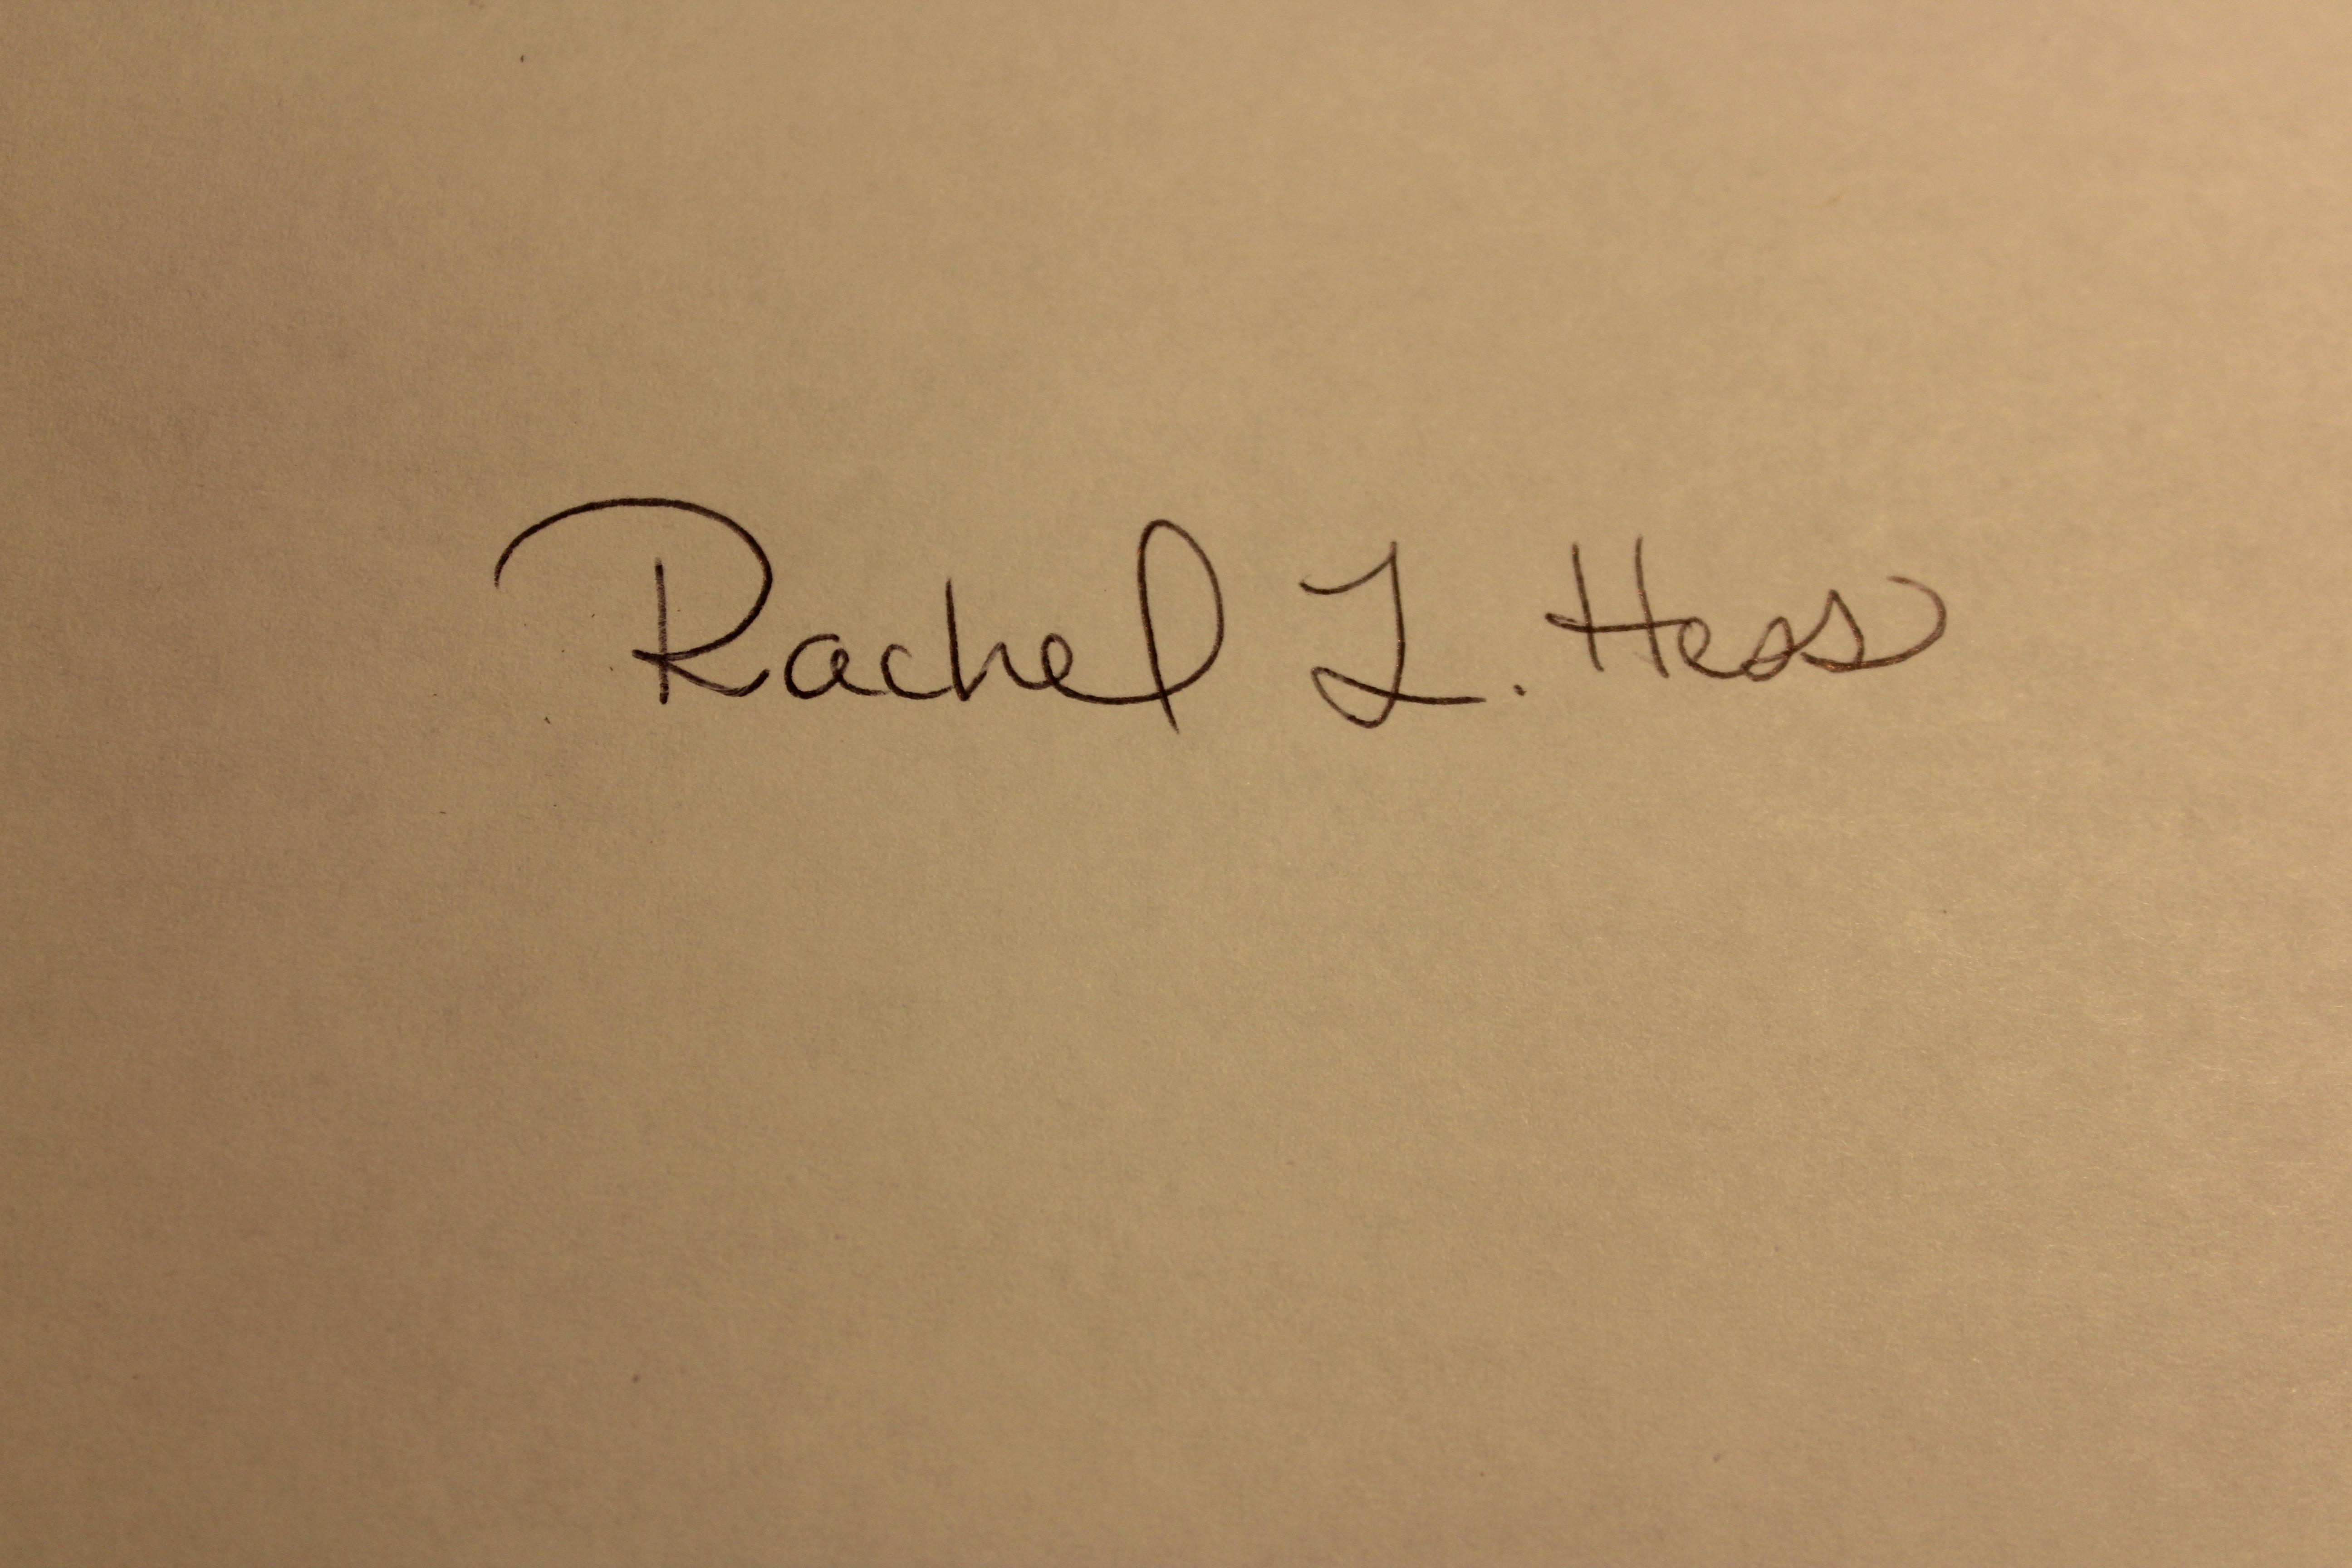 Rachel Hess's Signature